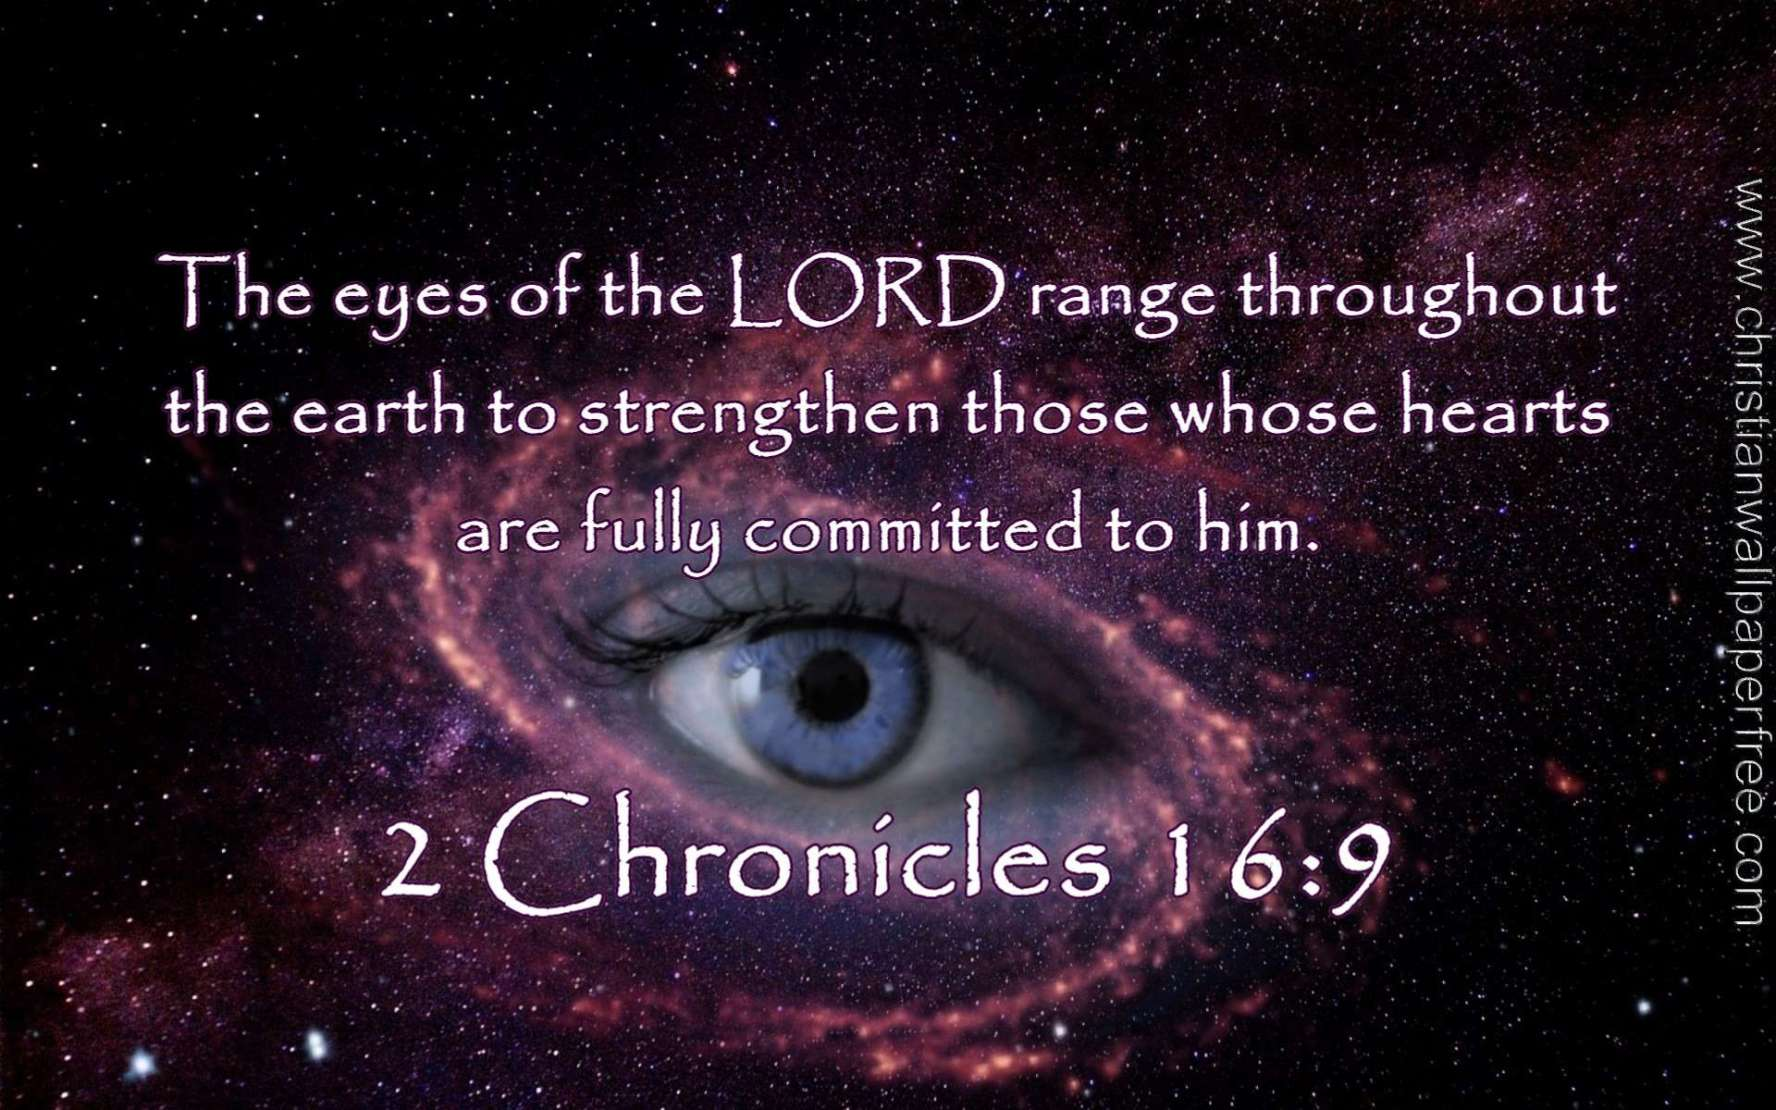 2 Chronicles 16 Verse 9